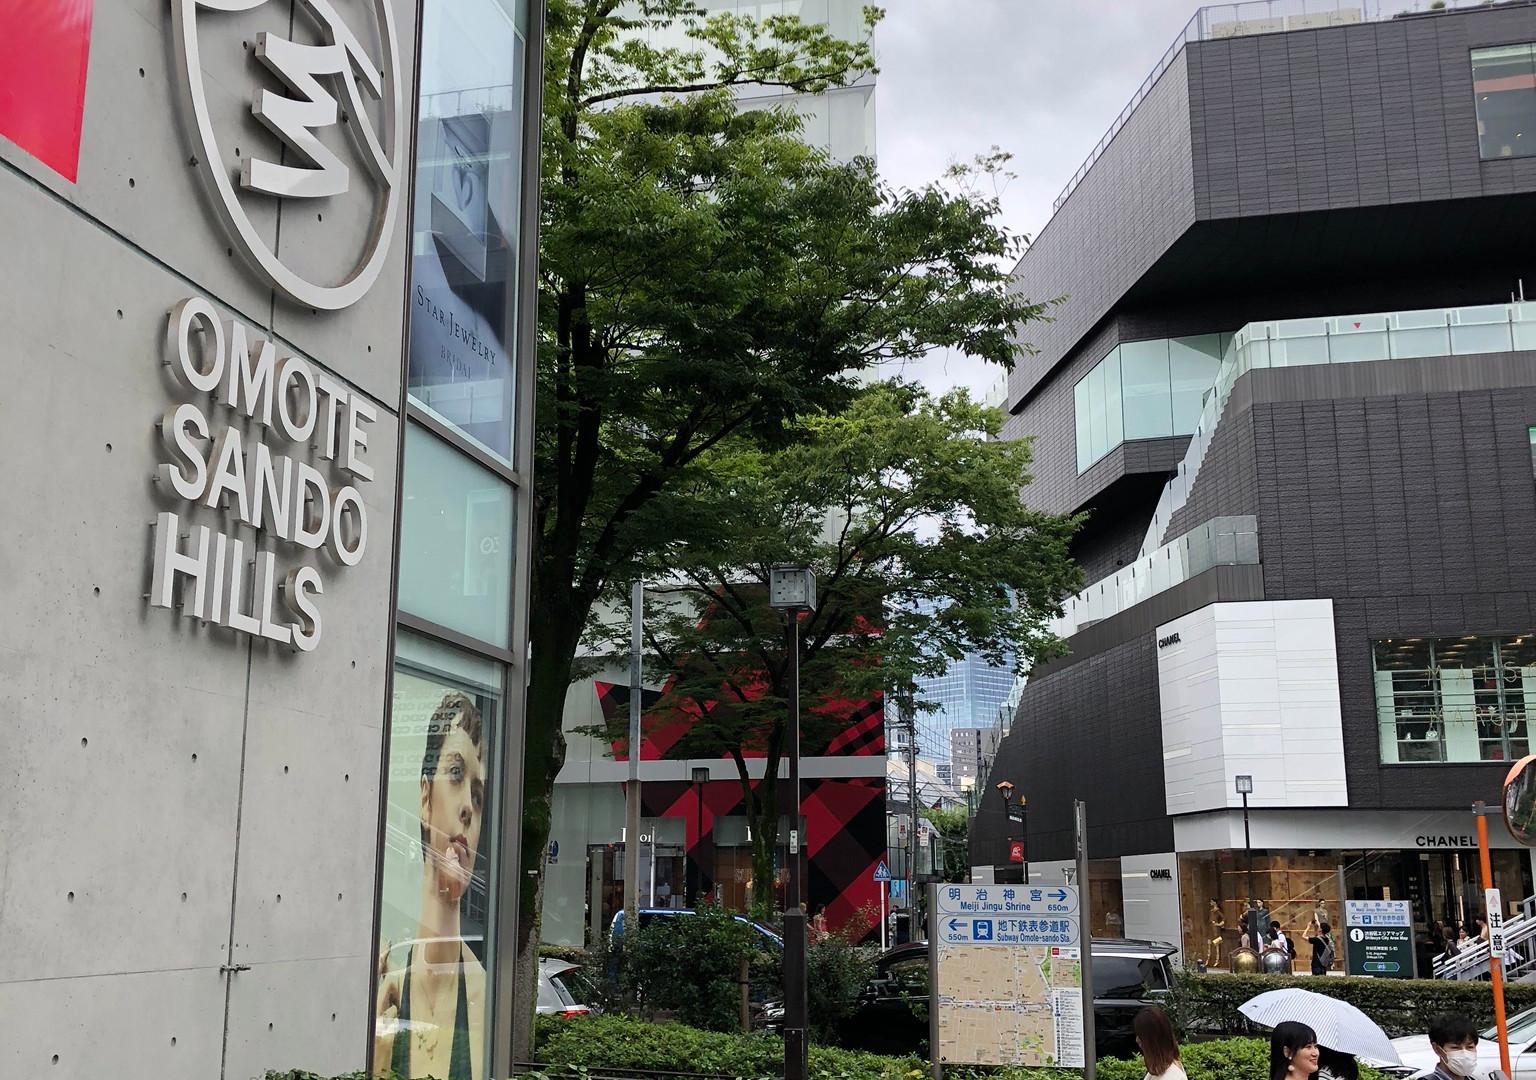 Gyre Store - Omotesando; designed by MVRDV